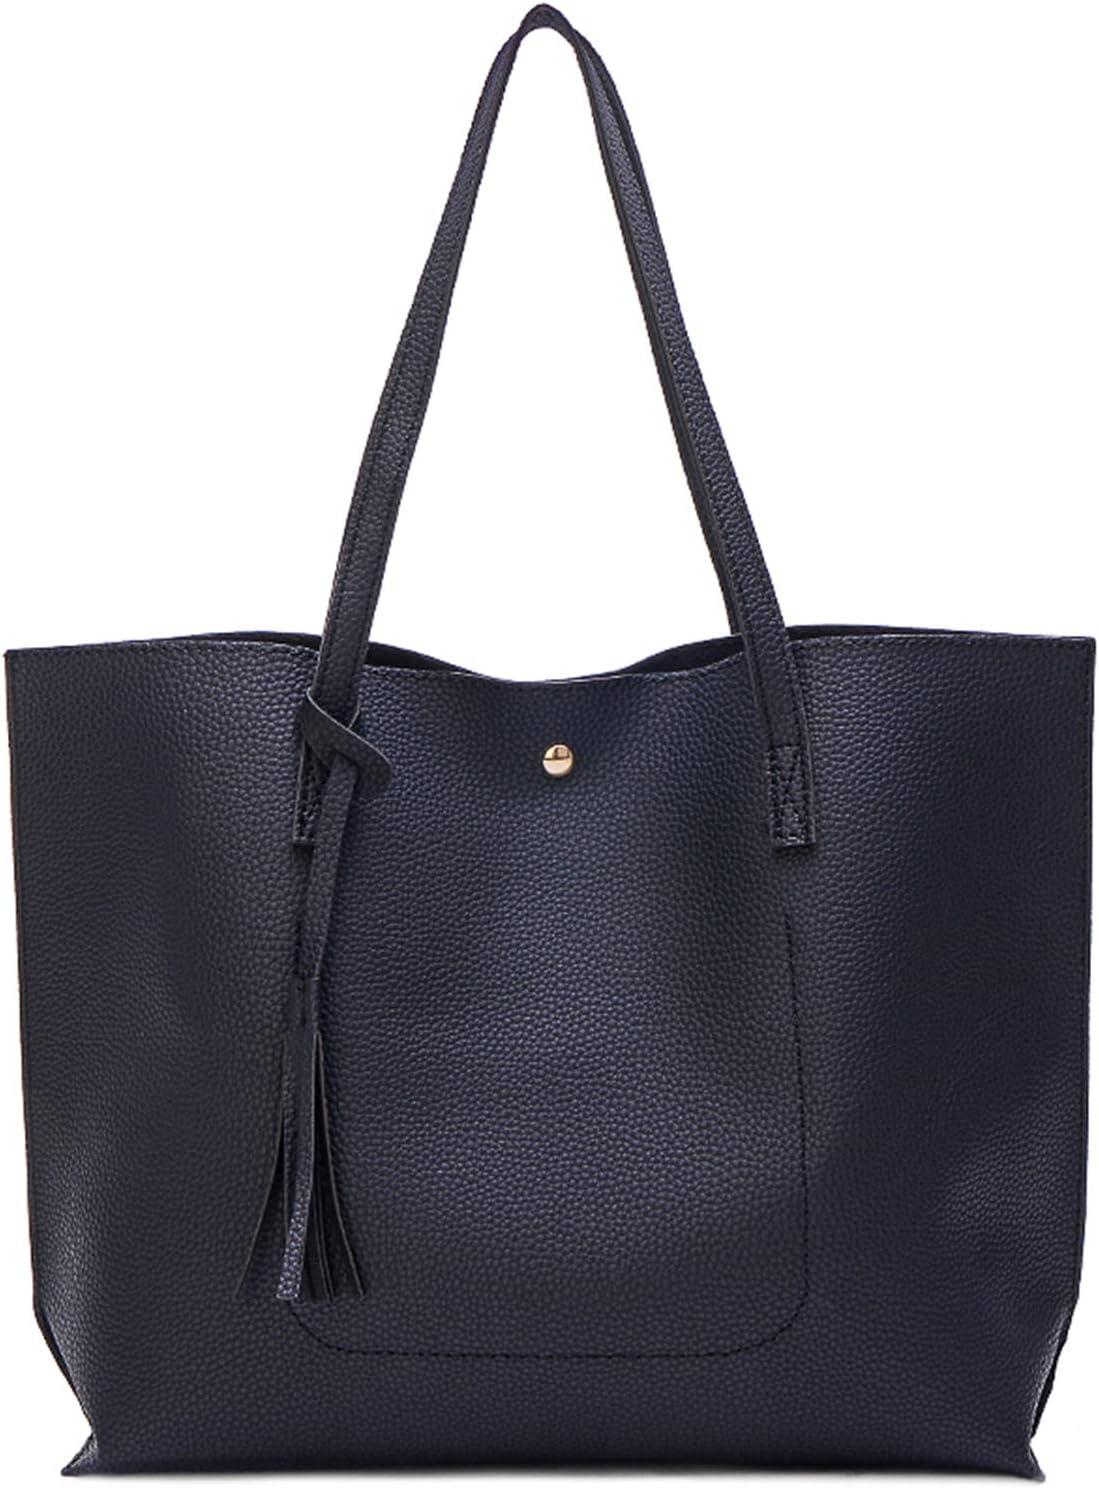 Myhozee Bolso de Mujer Hombro Grande Bolso Bandolera Bolsos de Mujer de Cuero Suave de PU Cuero para Las Damas Shopper Impermeable Bolso Señora Tote Bag Bolso Mano Shopping Bags(Negro)